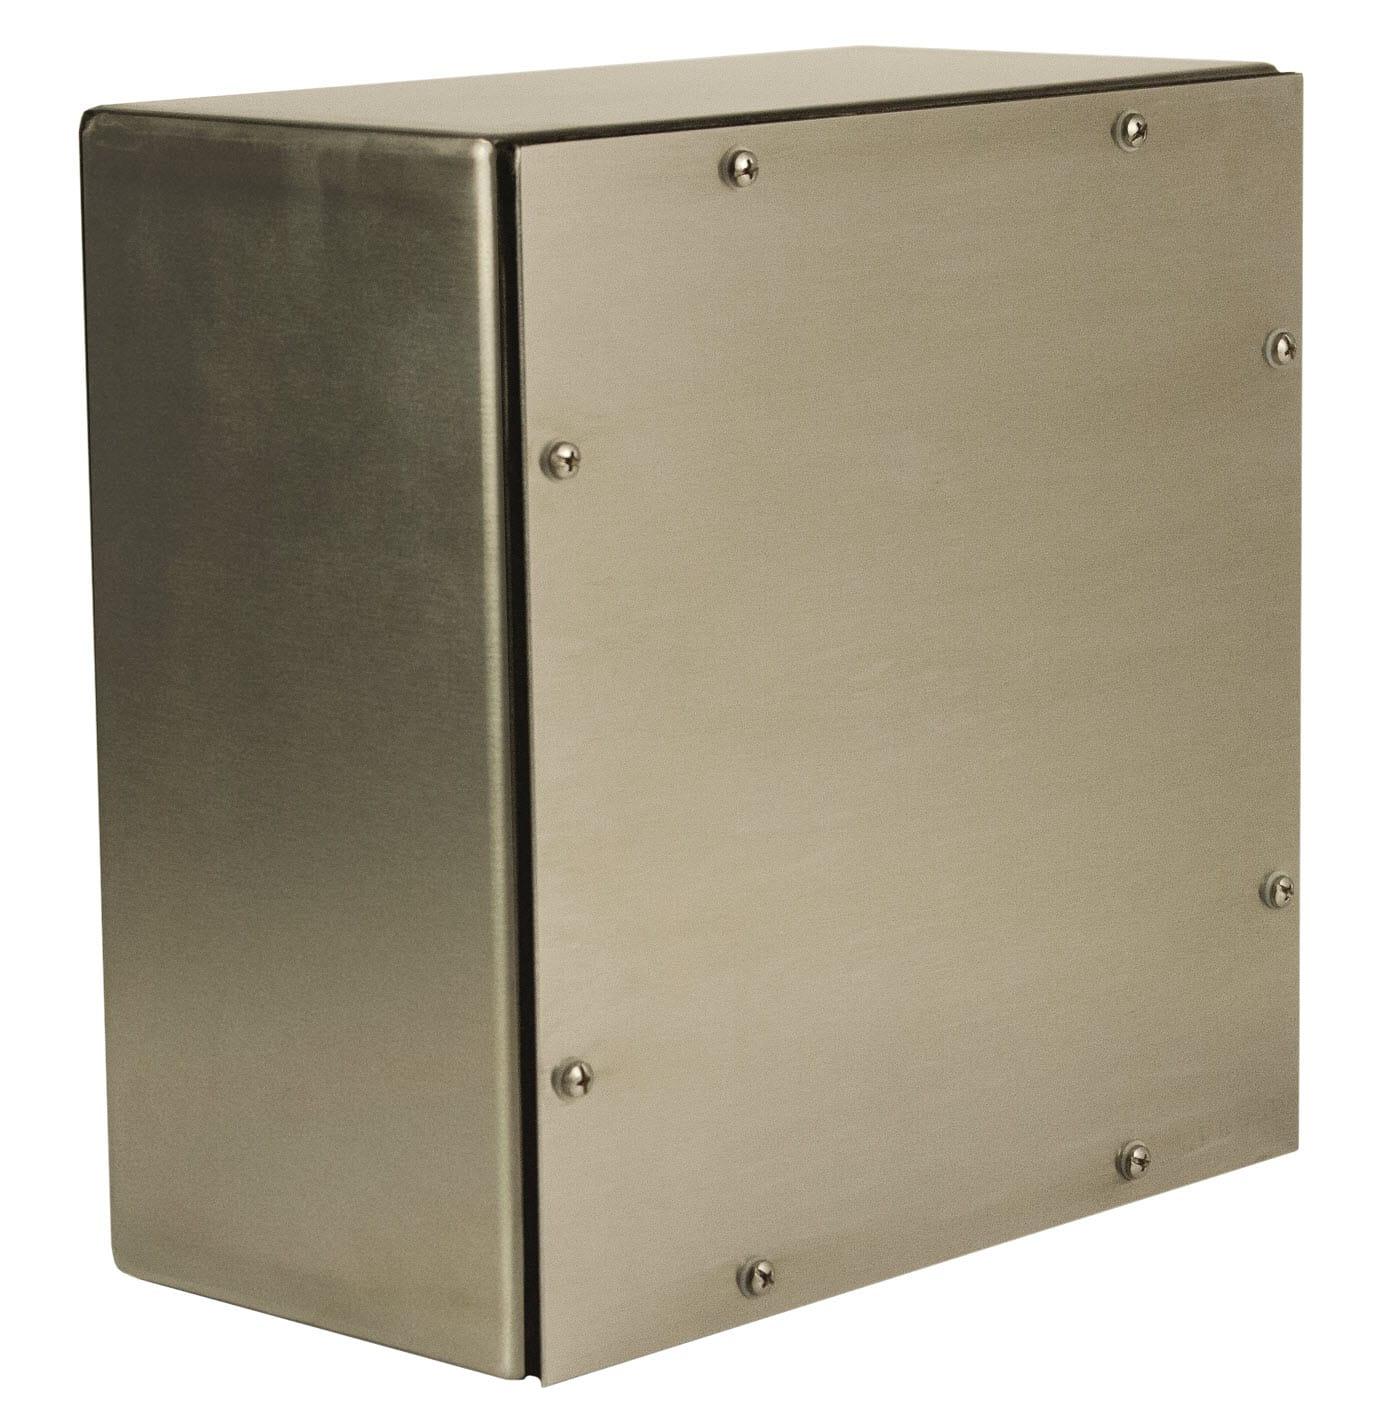 NEMA 4X Stainless Steel Screw Cover